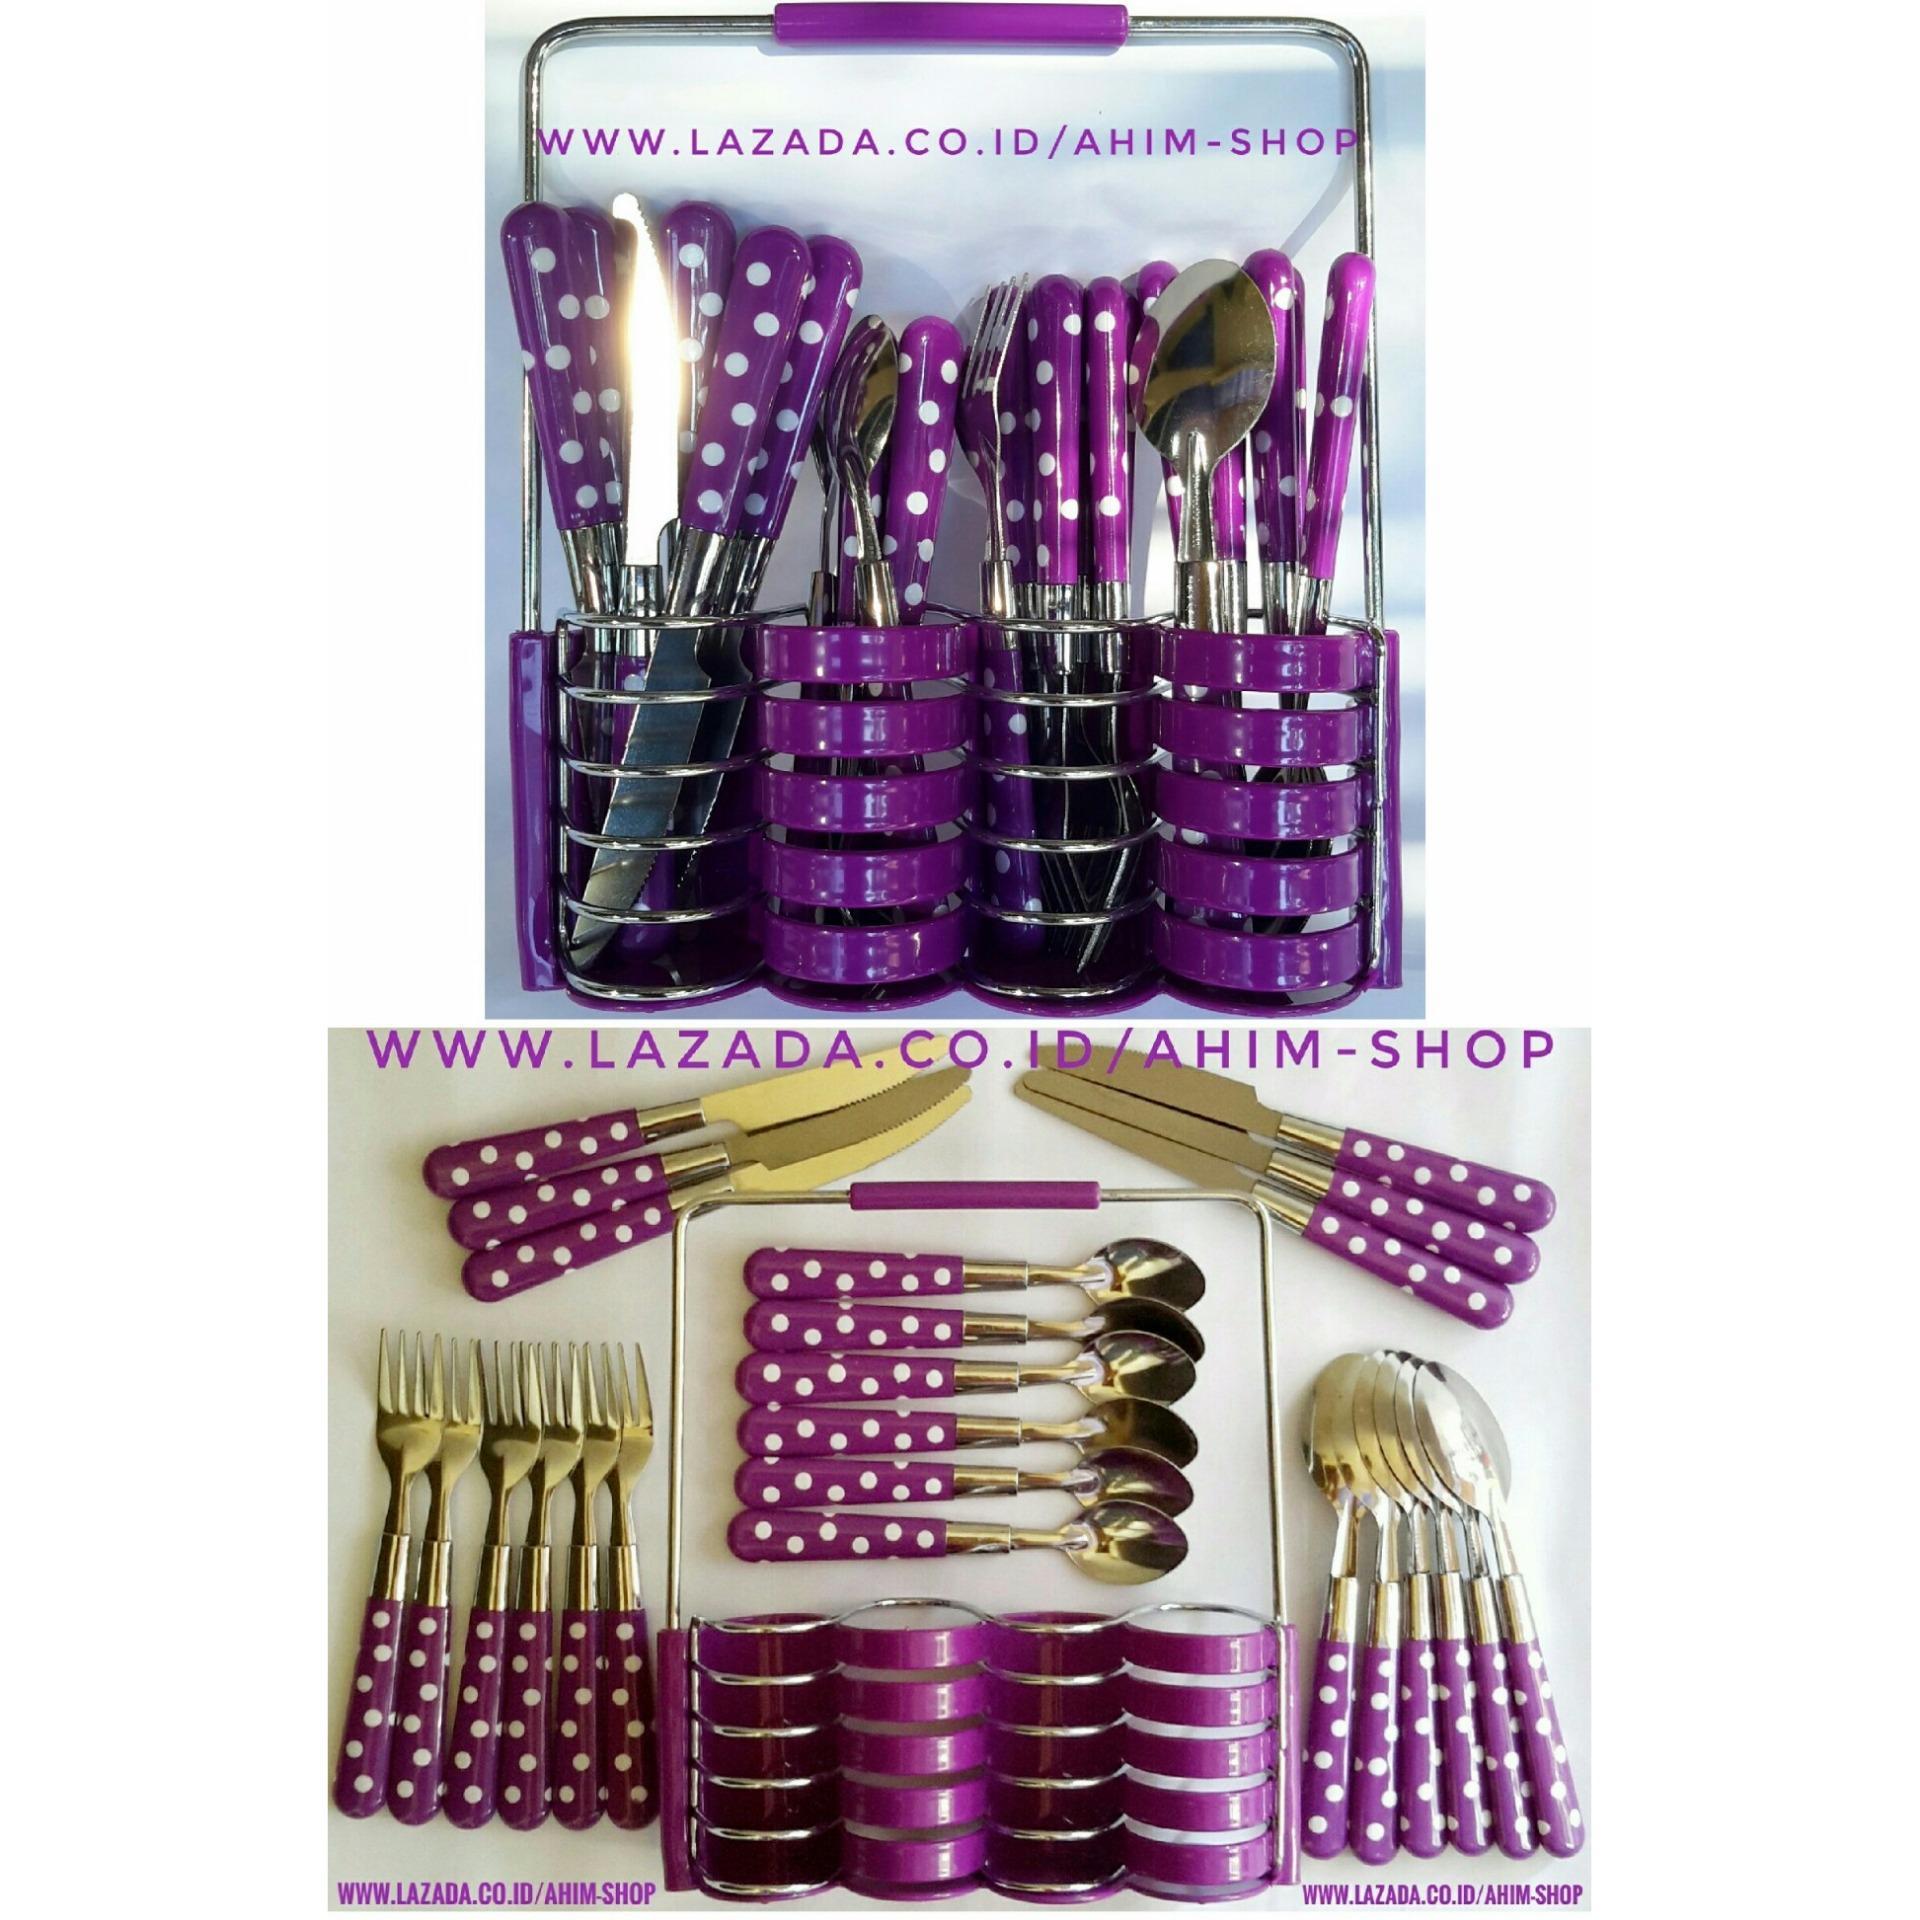 Harga Ahim Shop Stainless Steel Cutlery Set 24Pcs Peralatan Sendok Makan Sendok Teh Garpu Forks Pisau Knives Rak Polkadot Ungu Satu Set